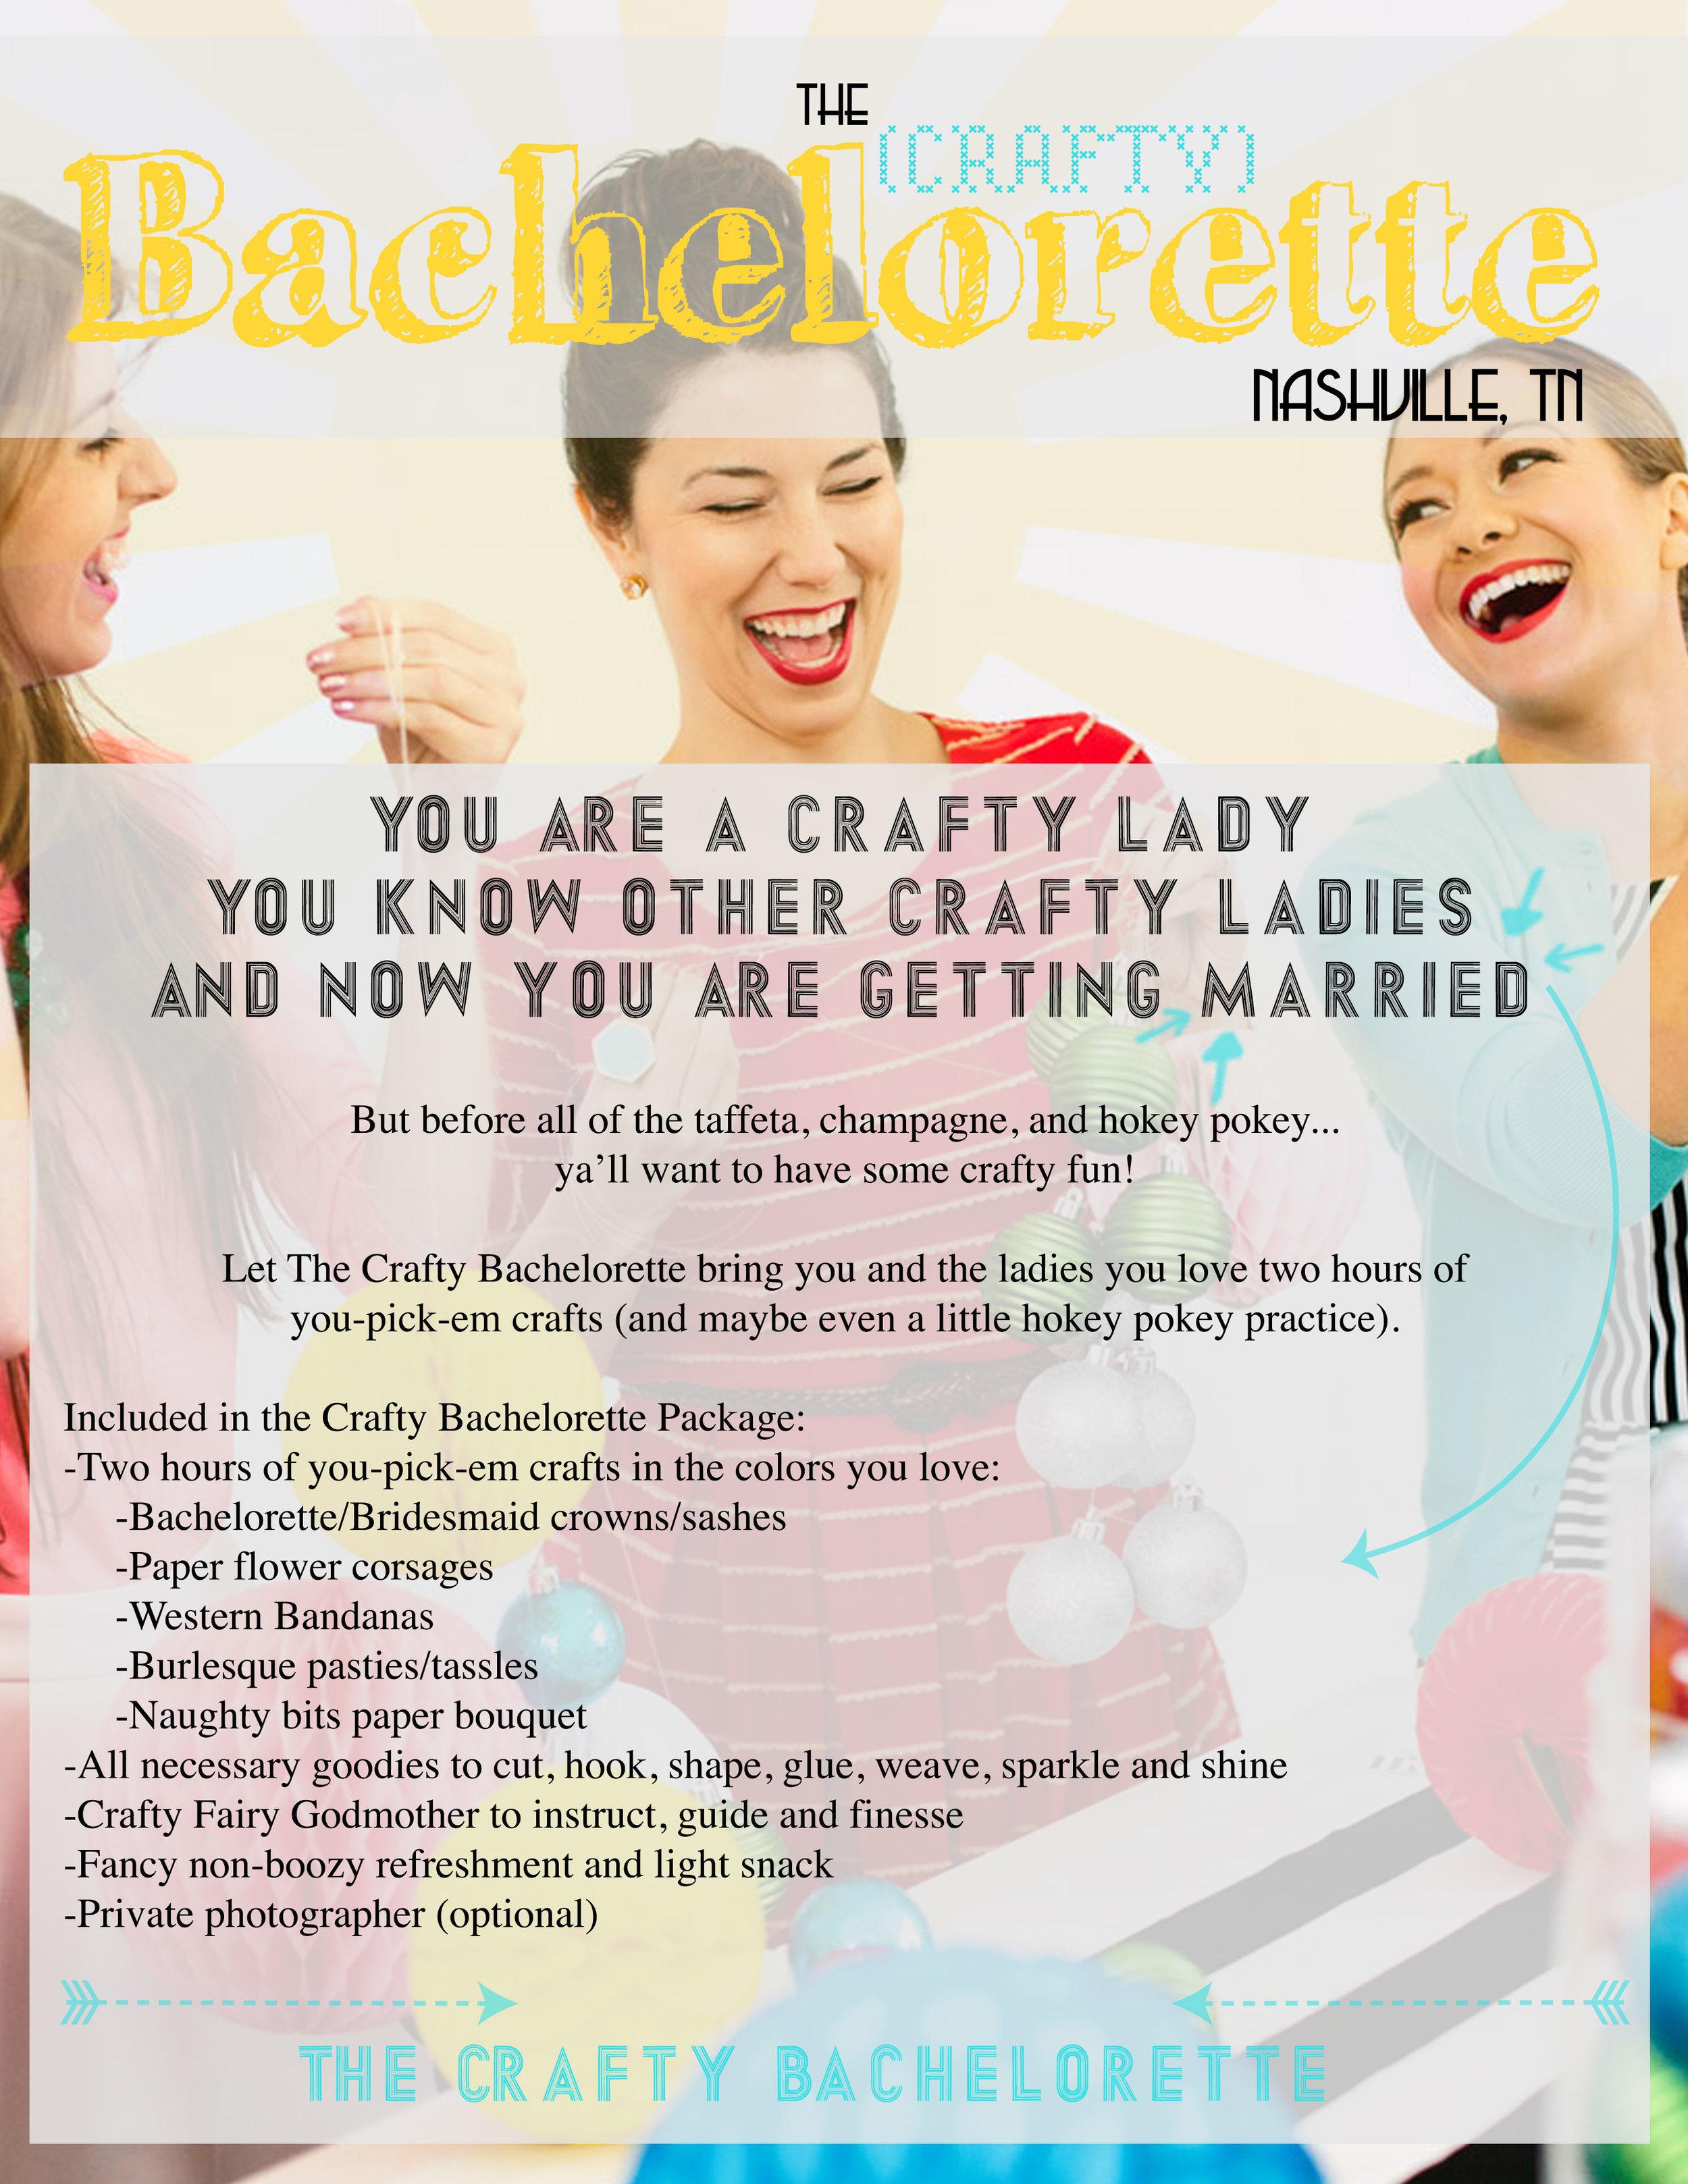 Crafty-Bachelorette.jpg